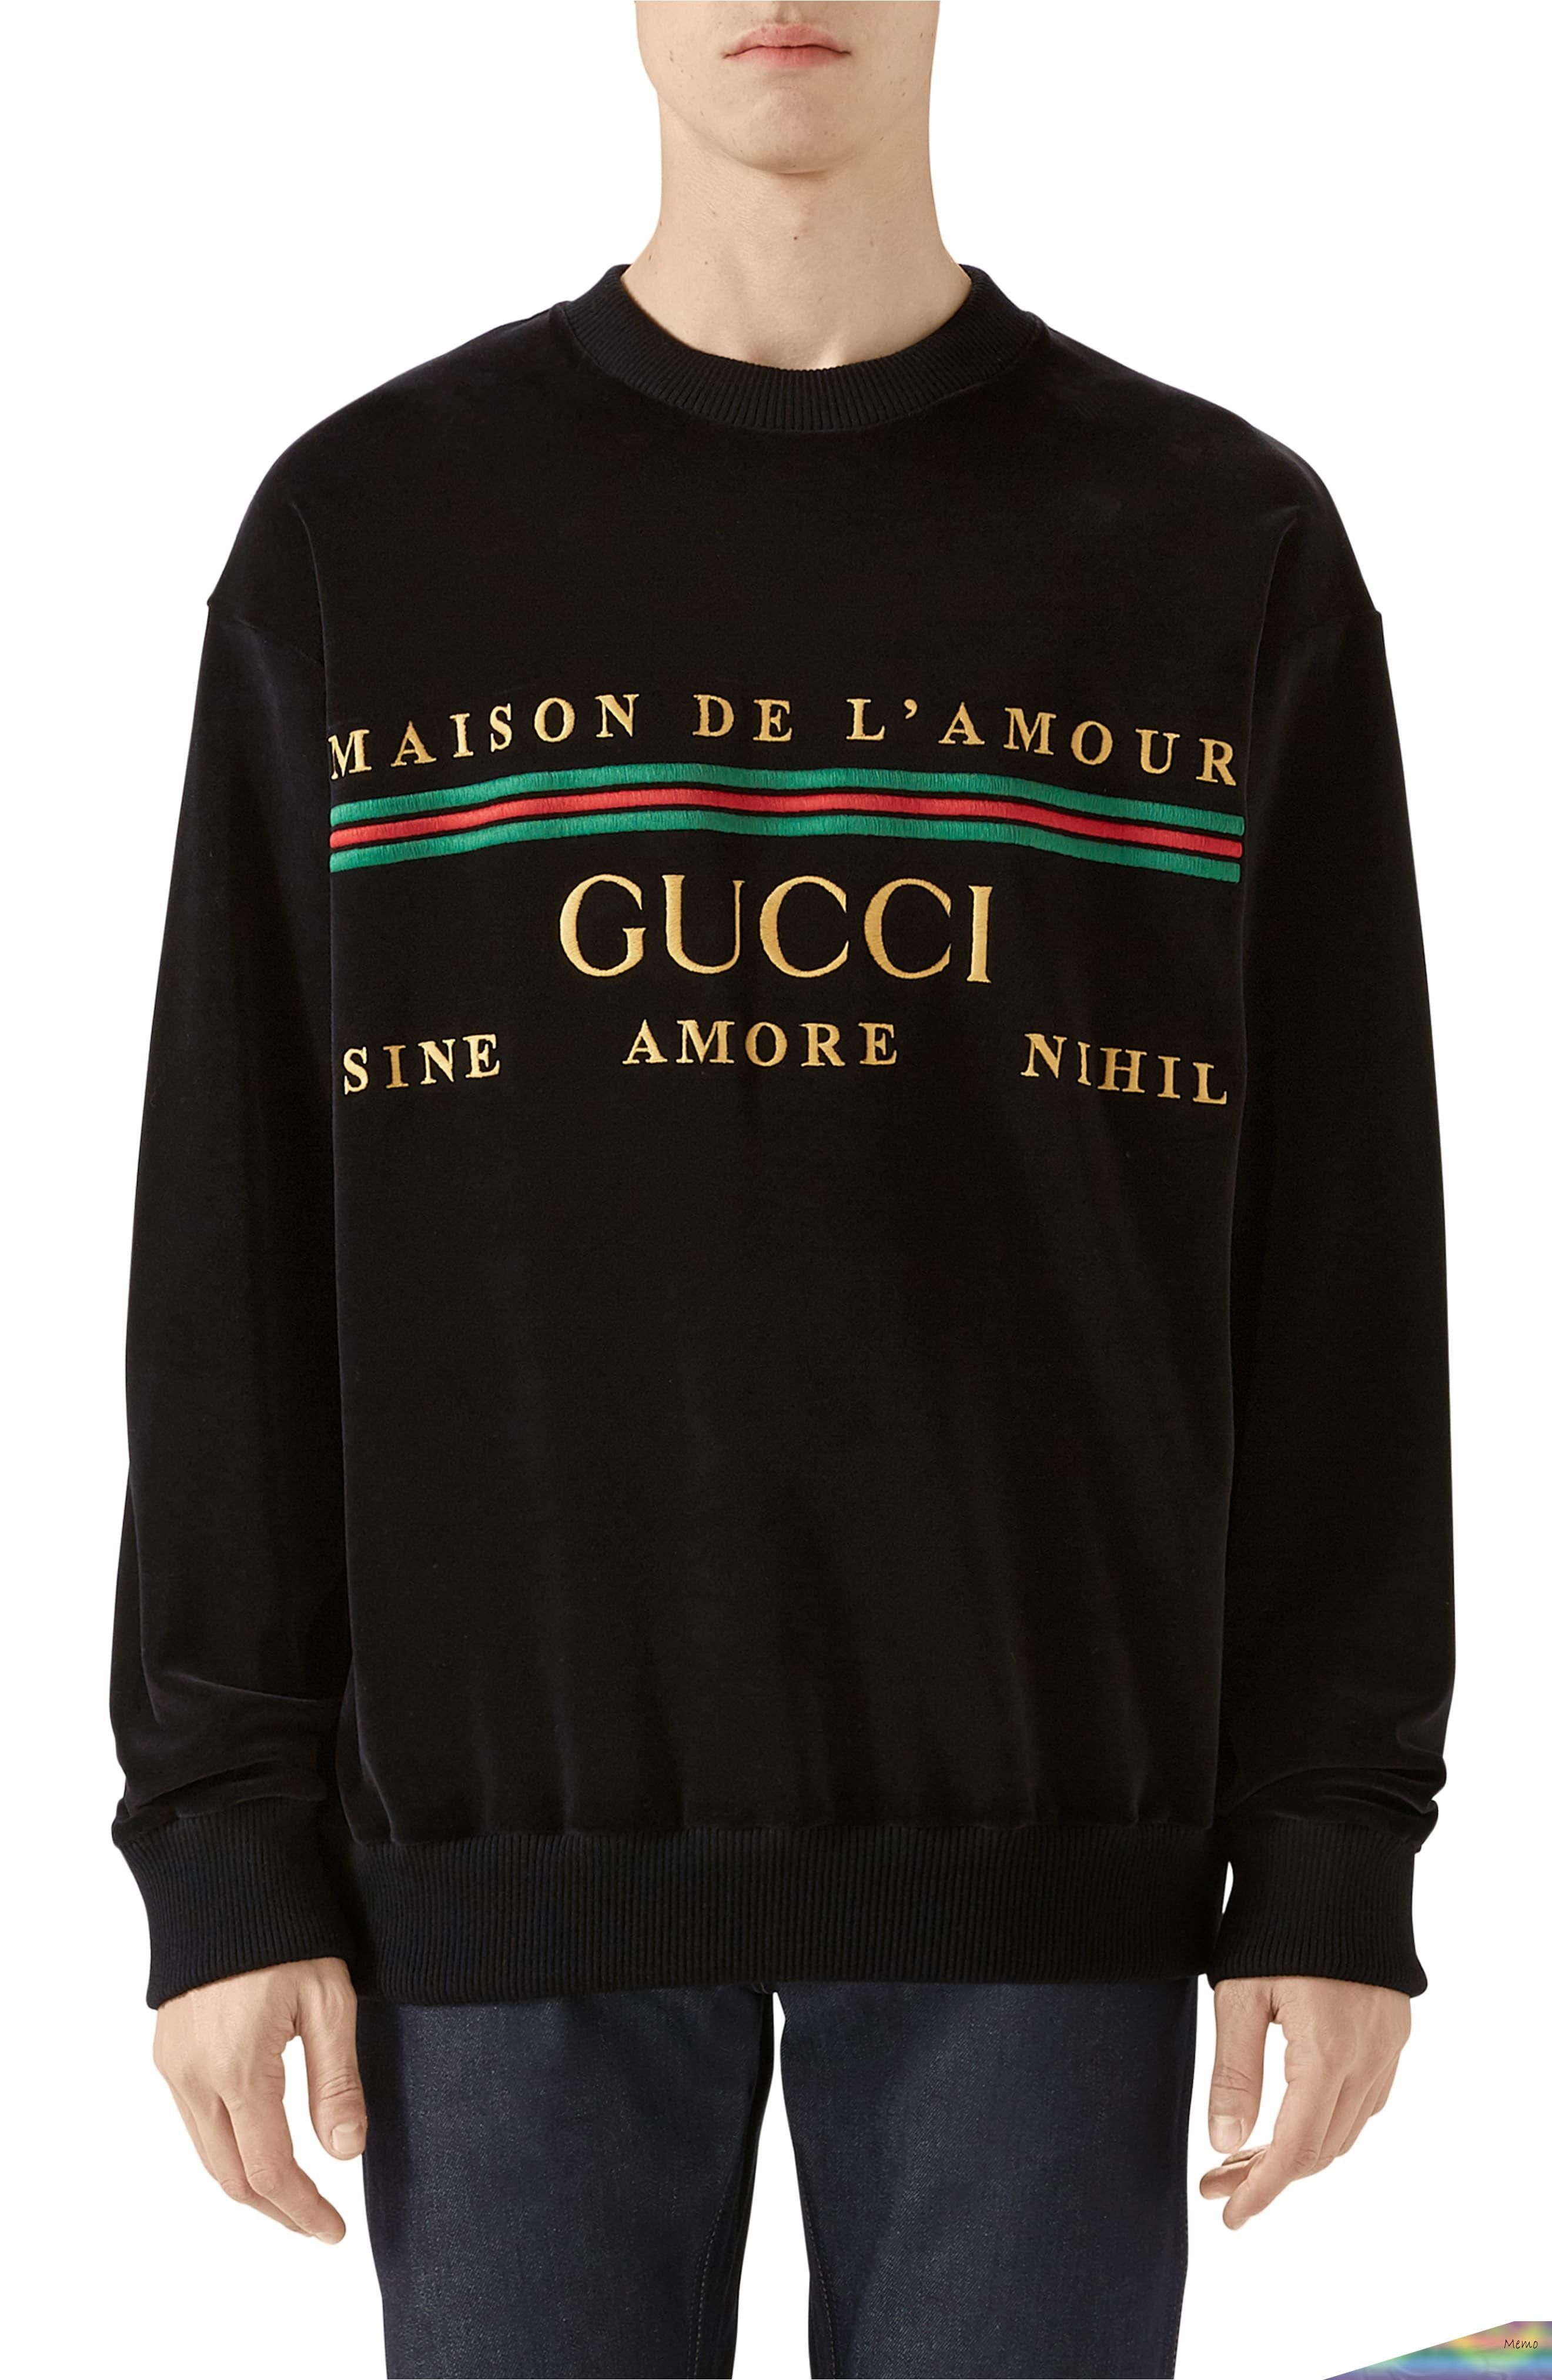 Aug 3 2019 Men S Gucci Embroidered Chenille Crewneck Sweatshirt Size Large Black Black Outfit Men Mens Outfits Mens Fashion Casual [ 4048 x 2640 Pixel ]